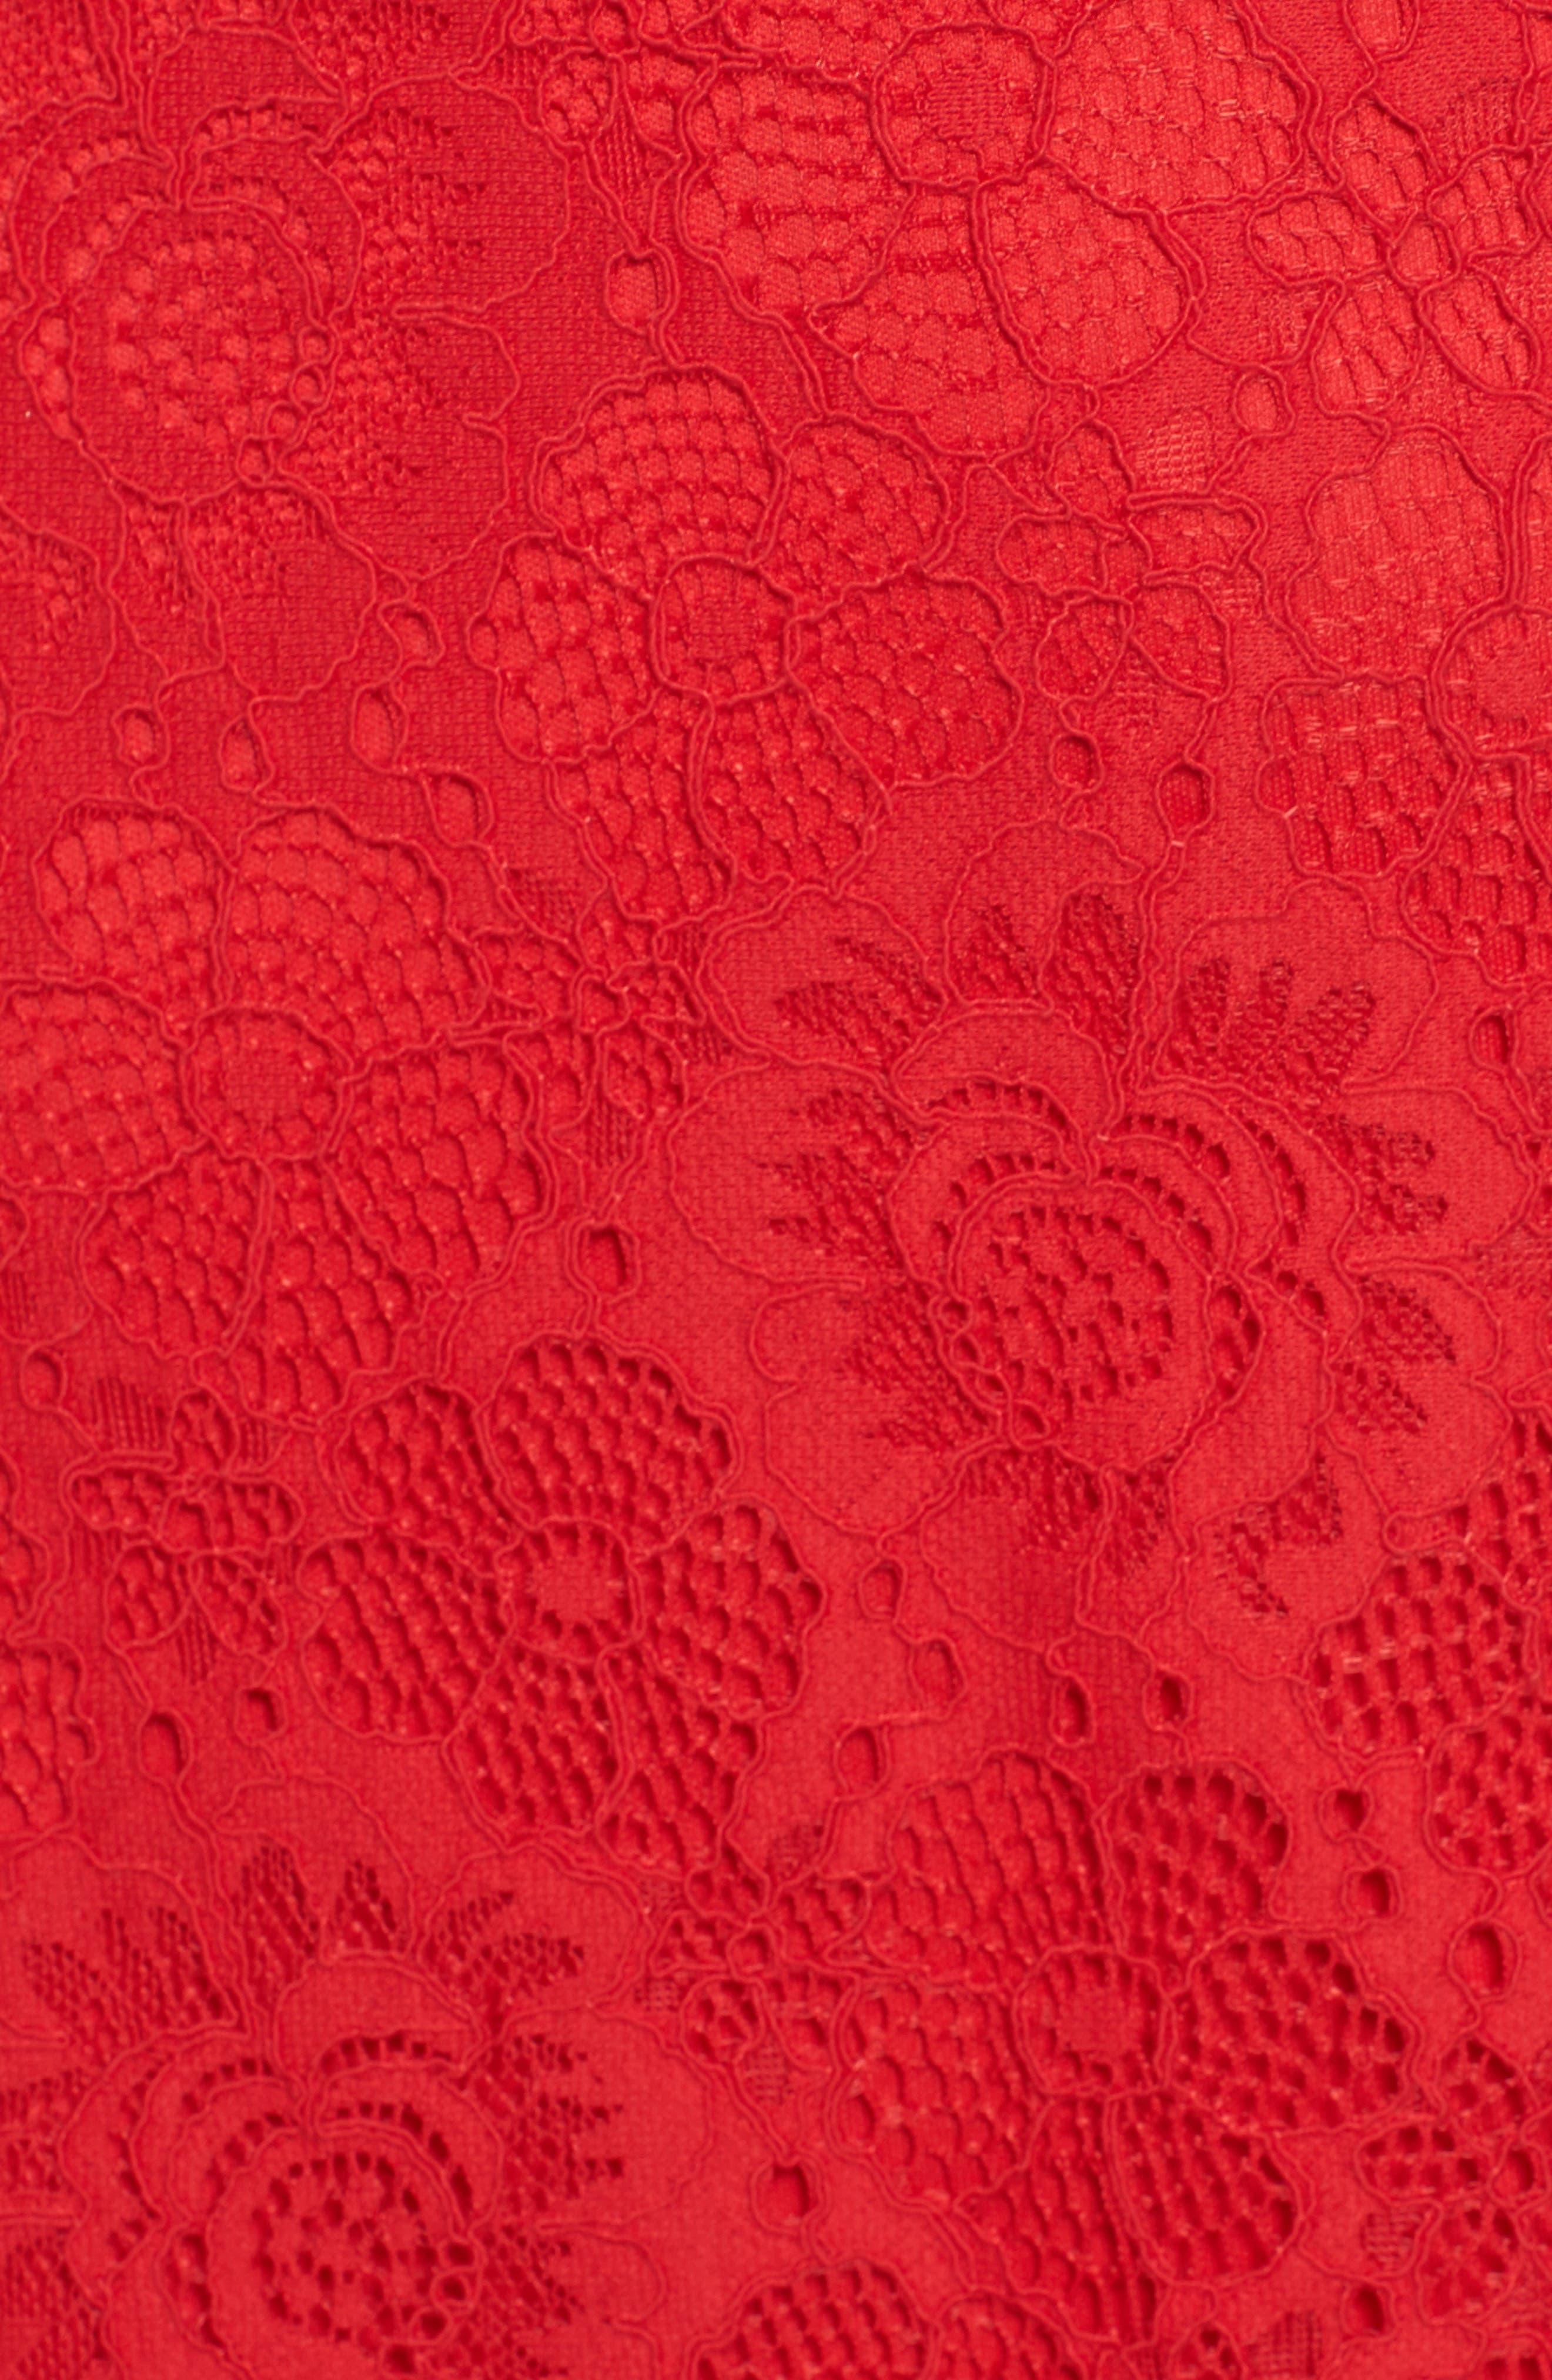 L'Amour Ruffle Halter Dress,                             Alternate thumbnail 5, color,                             600